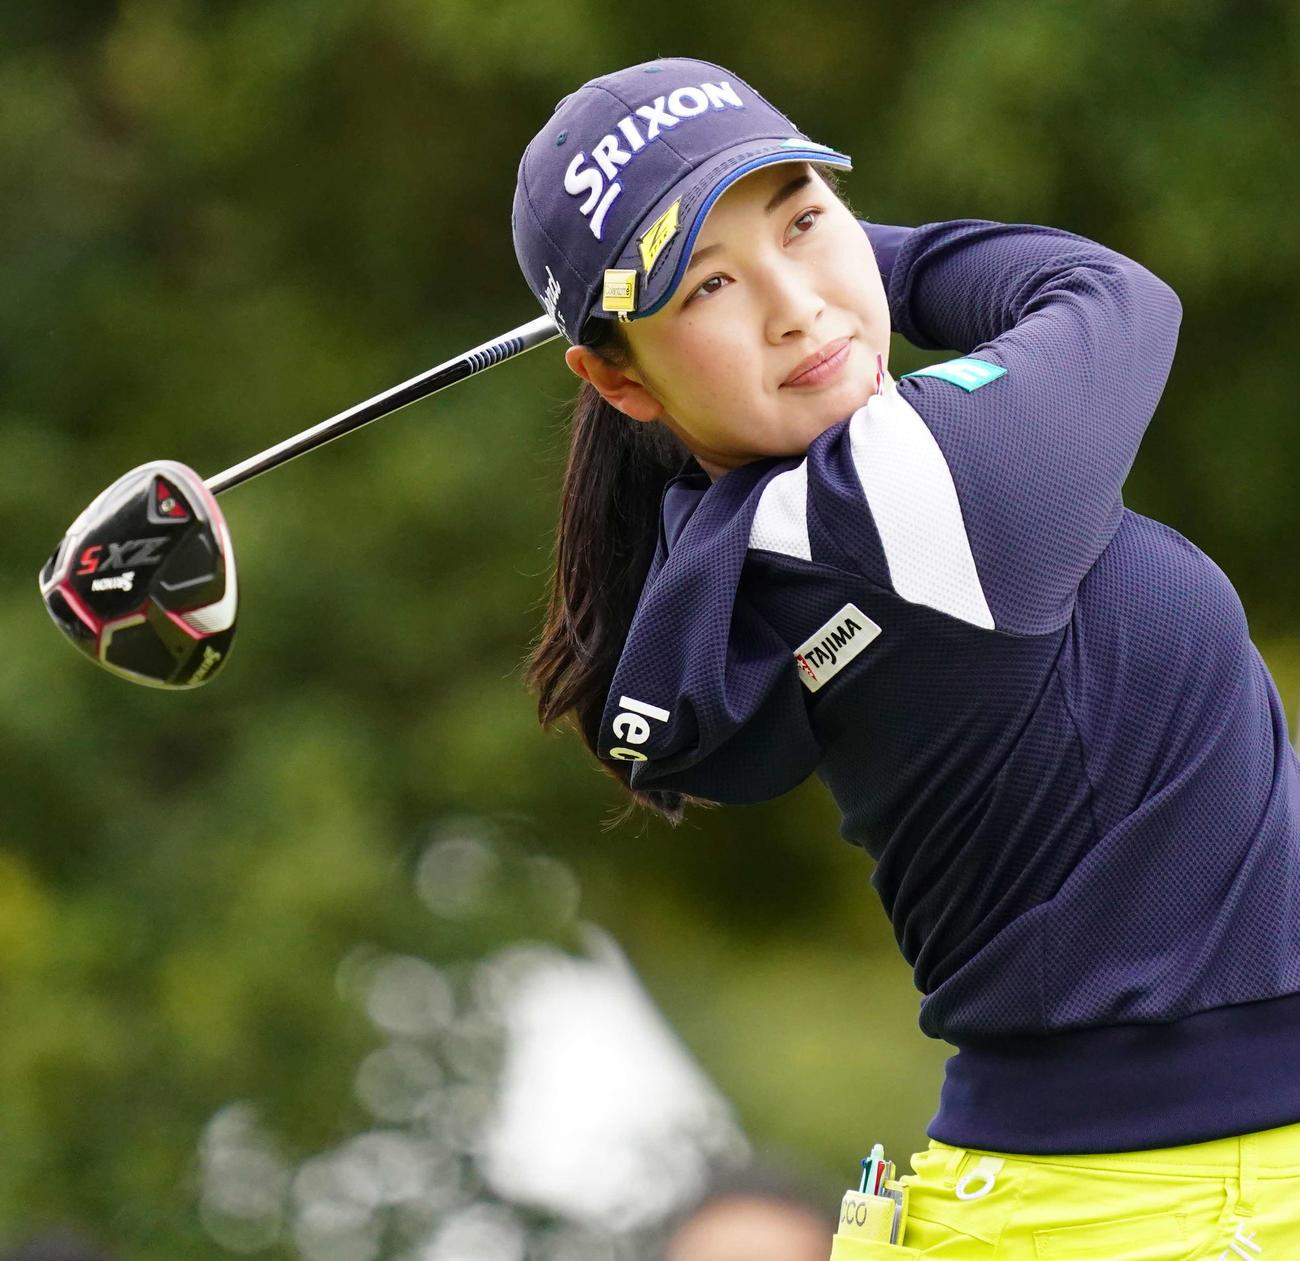 https://www.nikkansports.com/sports/golf/news/img/202104040000106-w1300_4.jpg